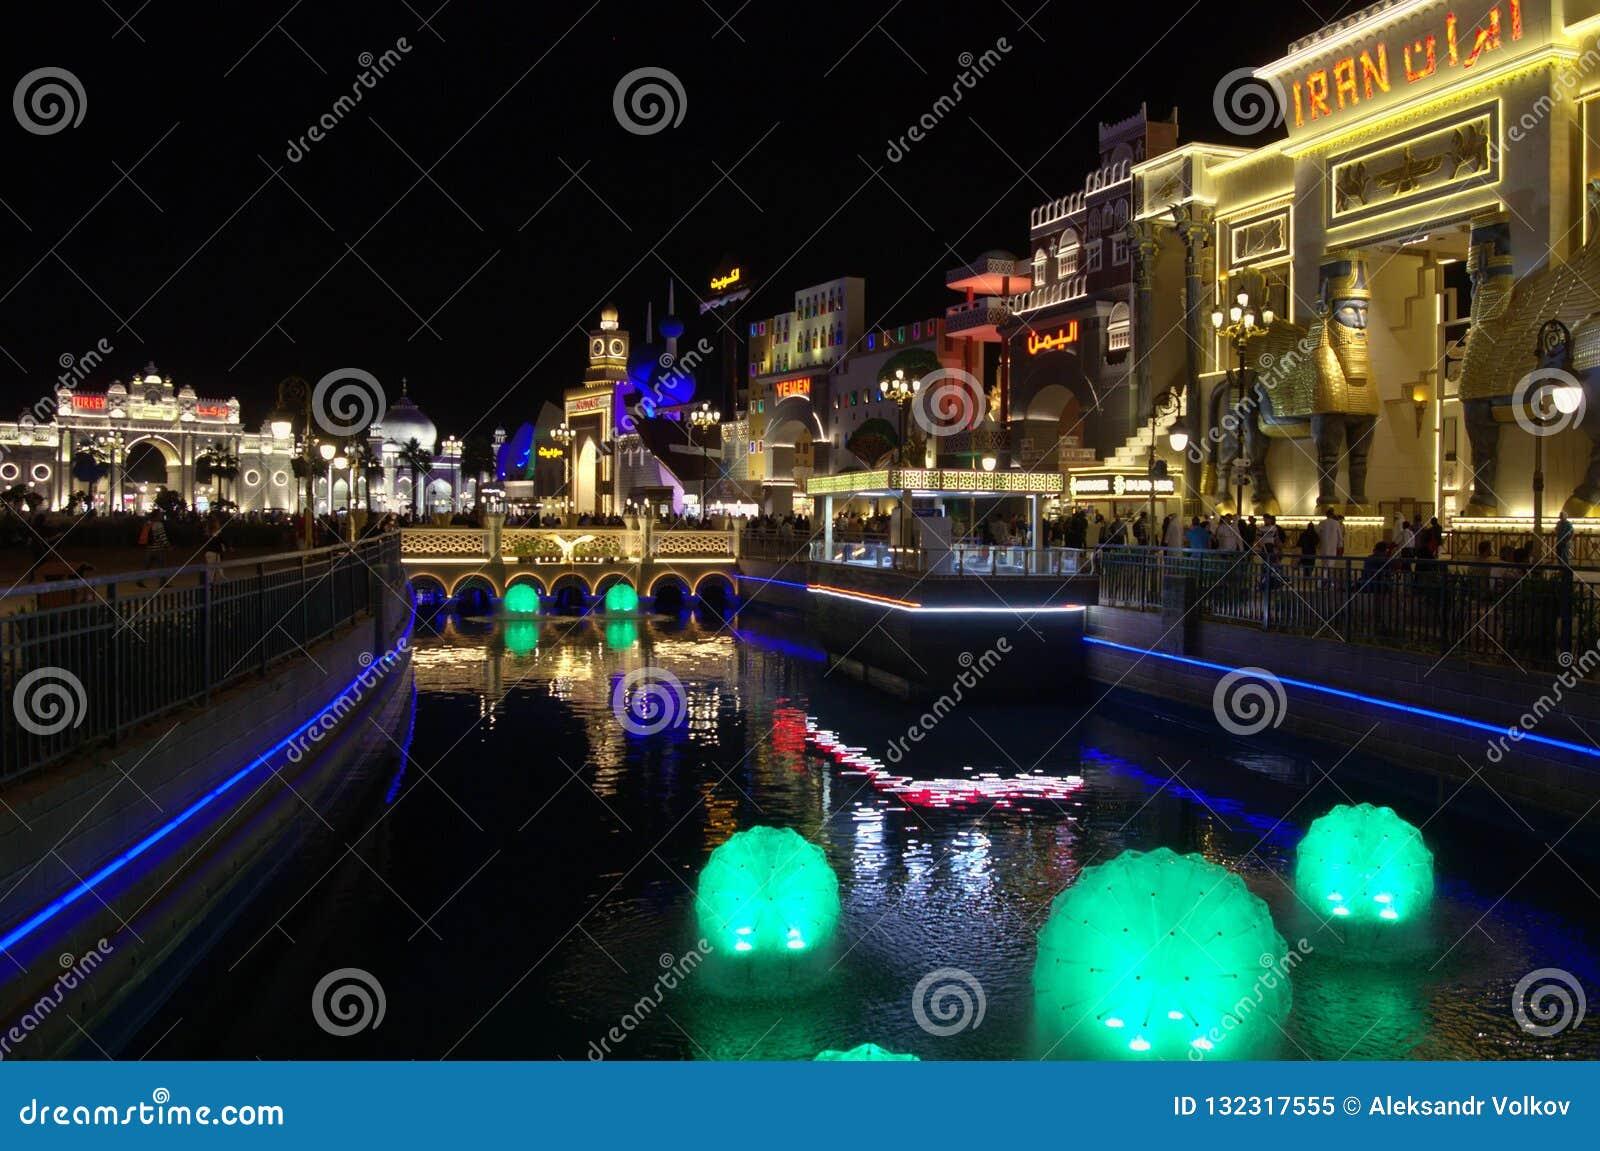 Global Village entertainment park Iran, Yemen and Turkey pavili